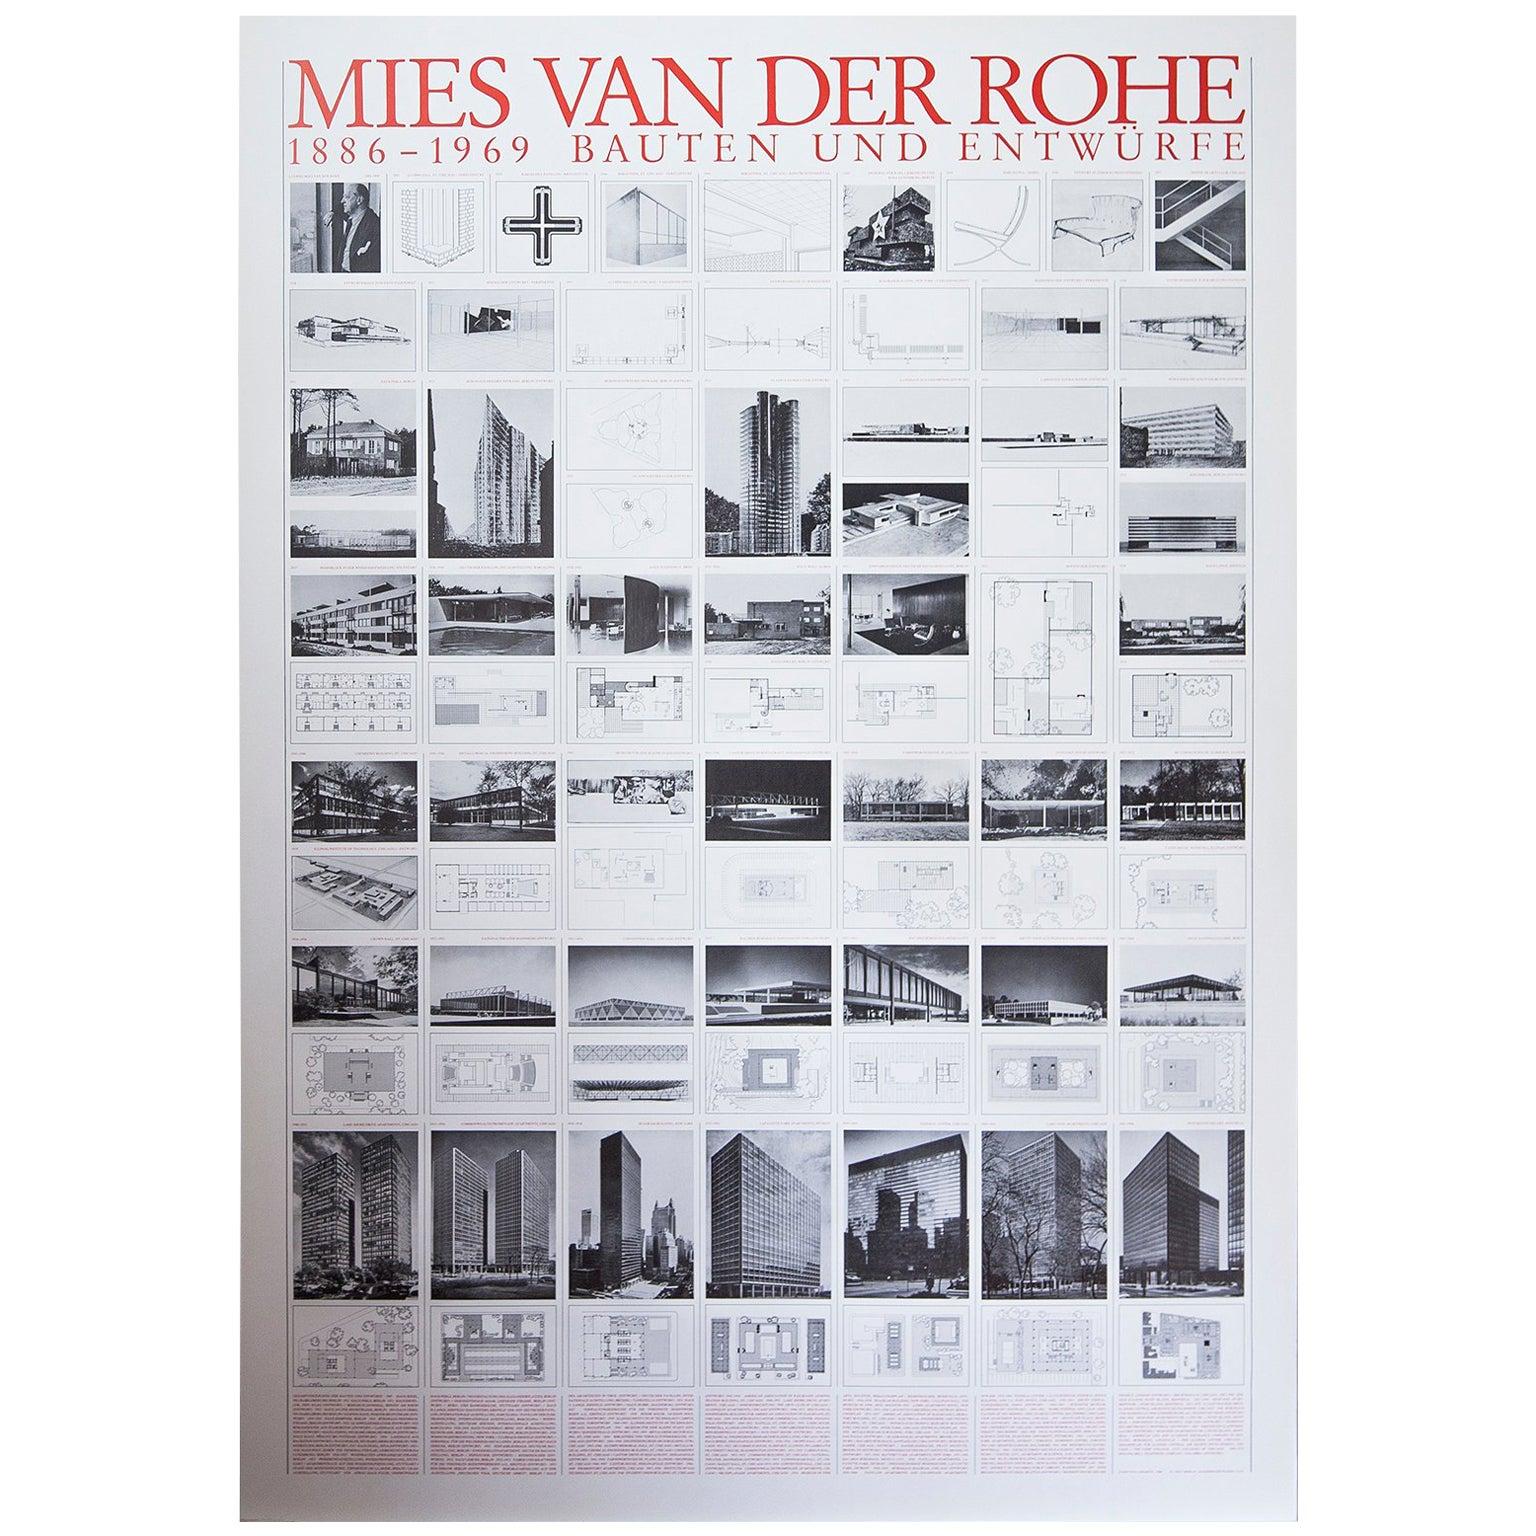 Mies Van Der Rohe Design Philosophy.Mies Van Der Rohe Bauhaus Buildings And Design 1886 1969 Poster